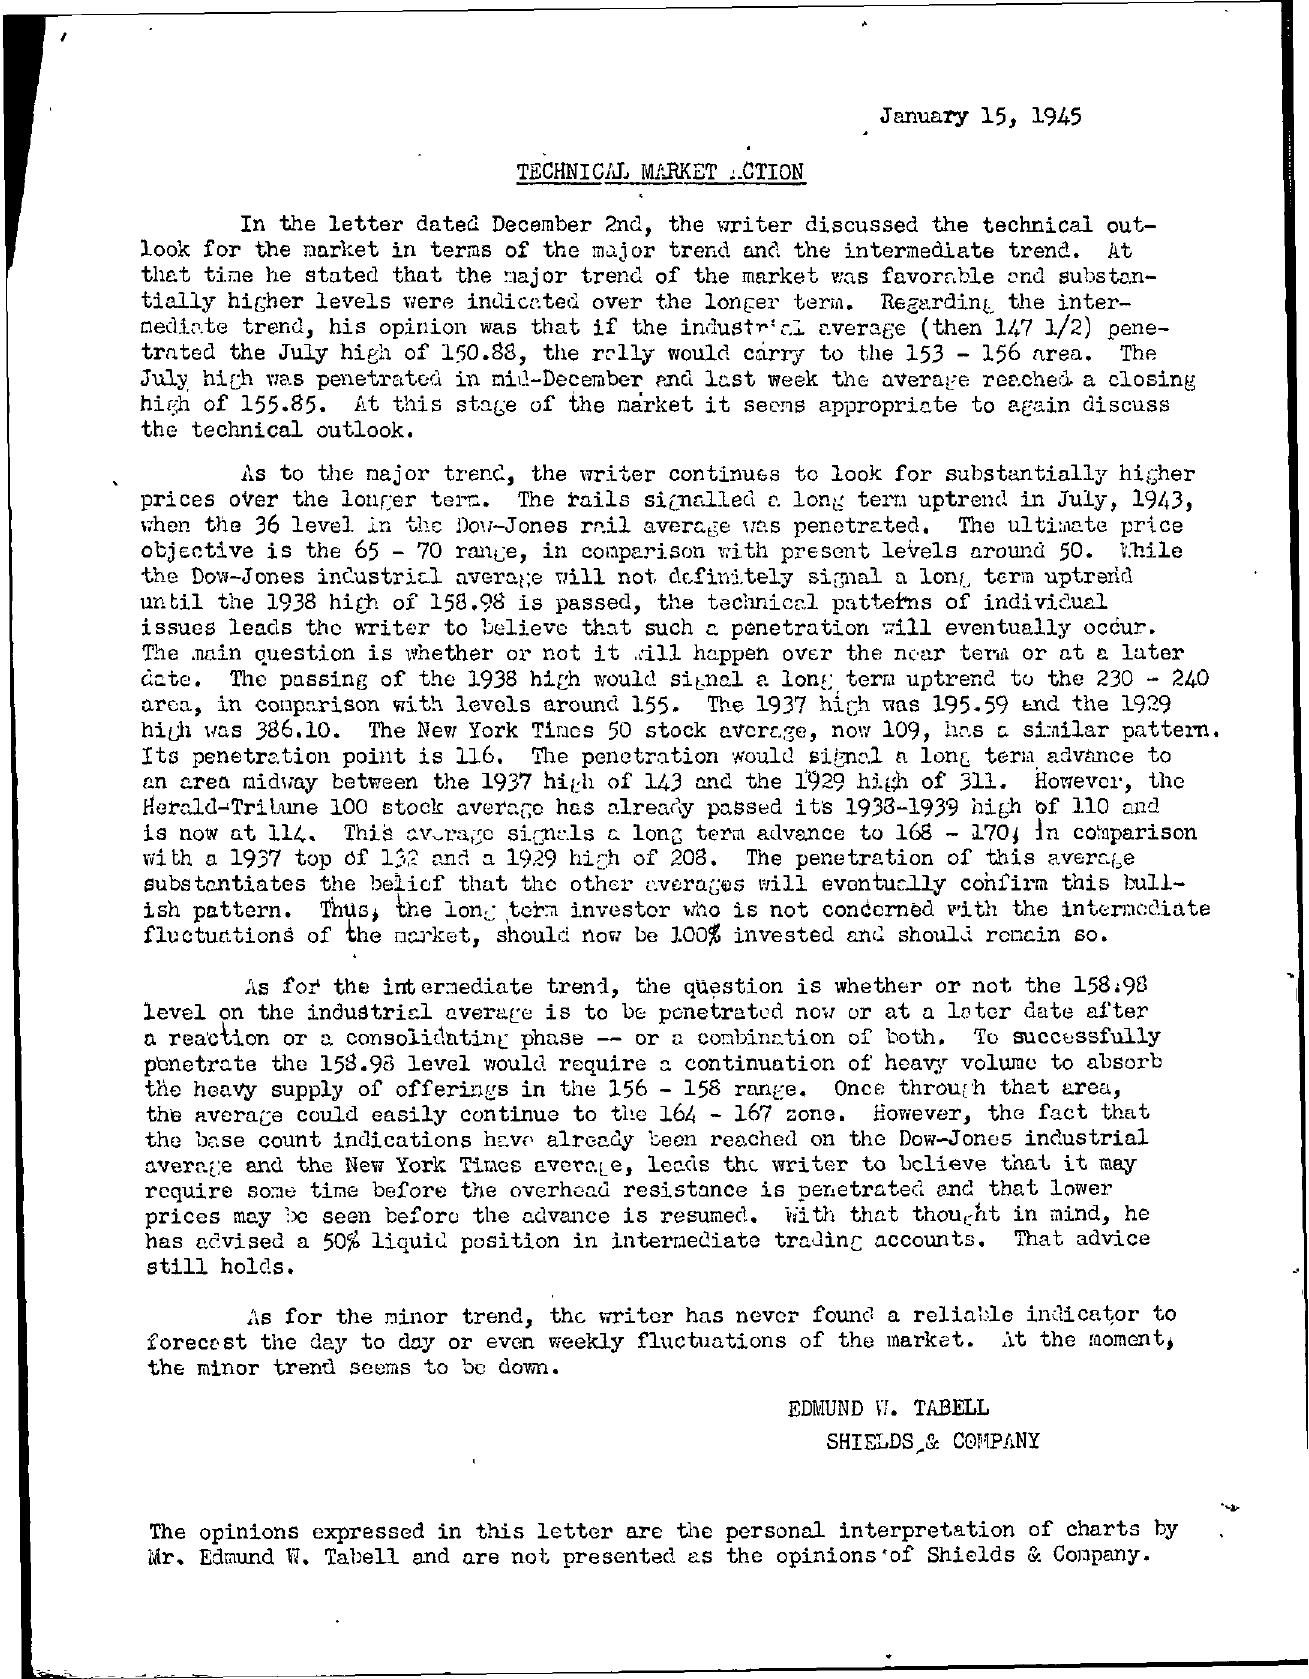 Tabell's Market Letter - January 15, 1945